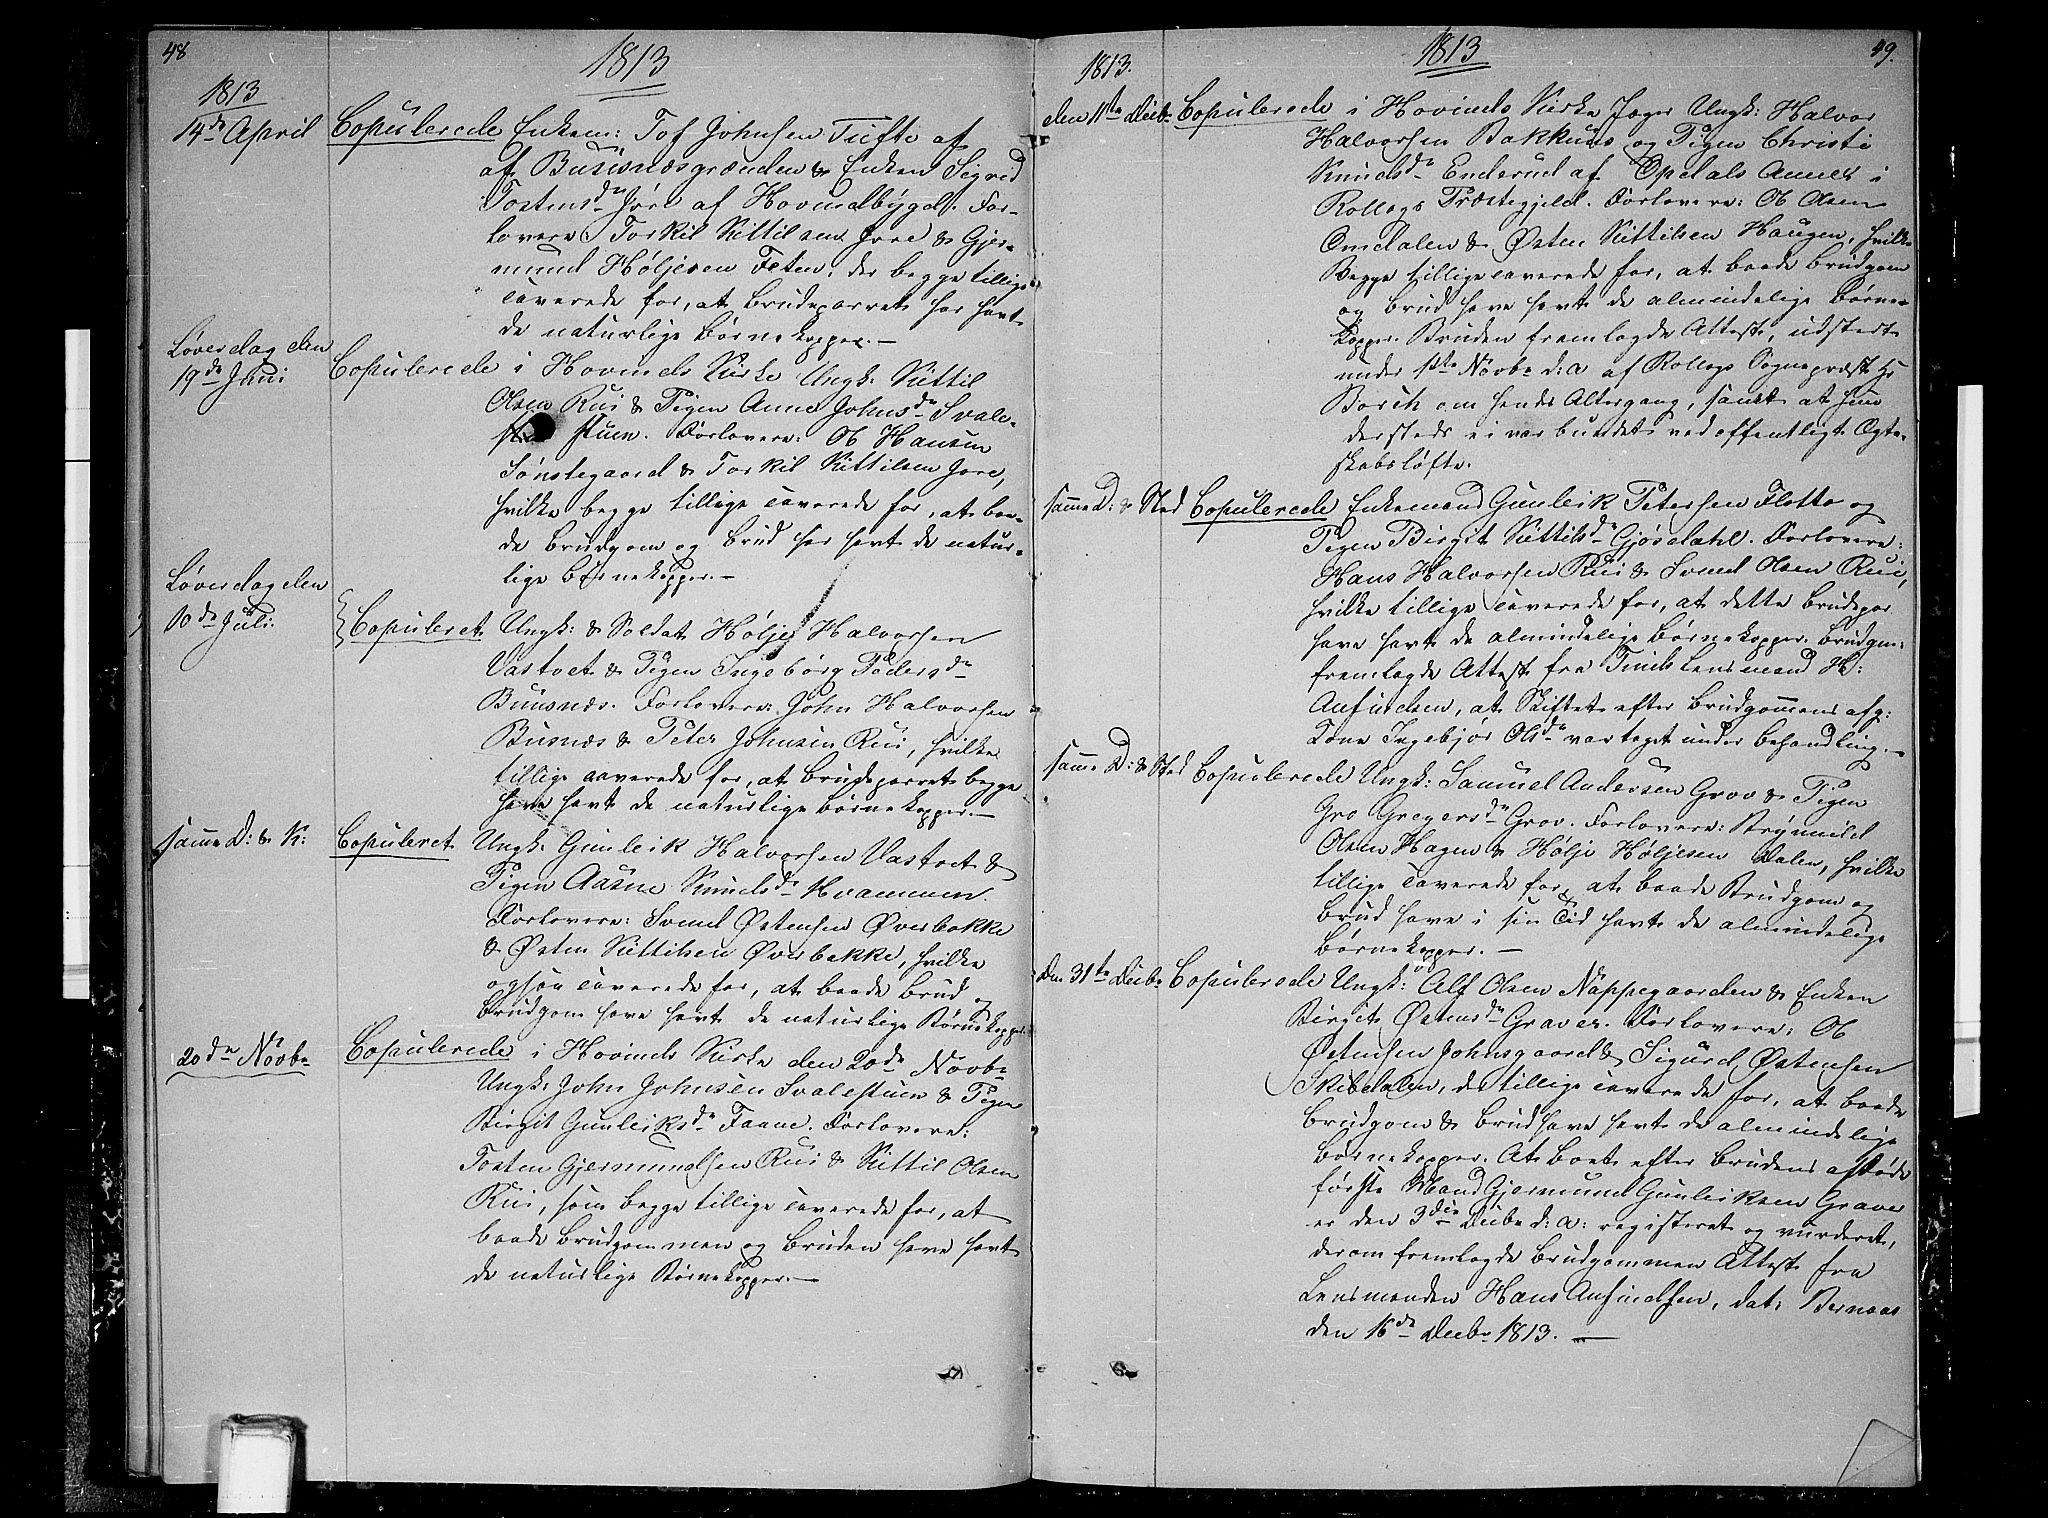 SAKO, Gransherad kirkebøker, F/Fb/L0001: Ministerialbok nr. II 1, 1800-1814, s. 48-49